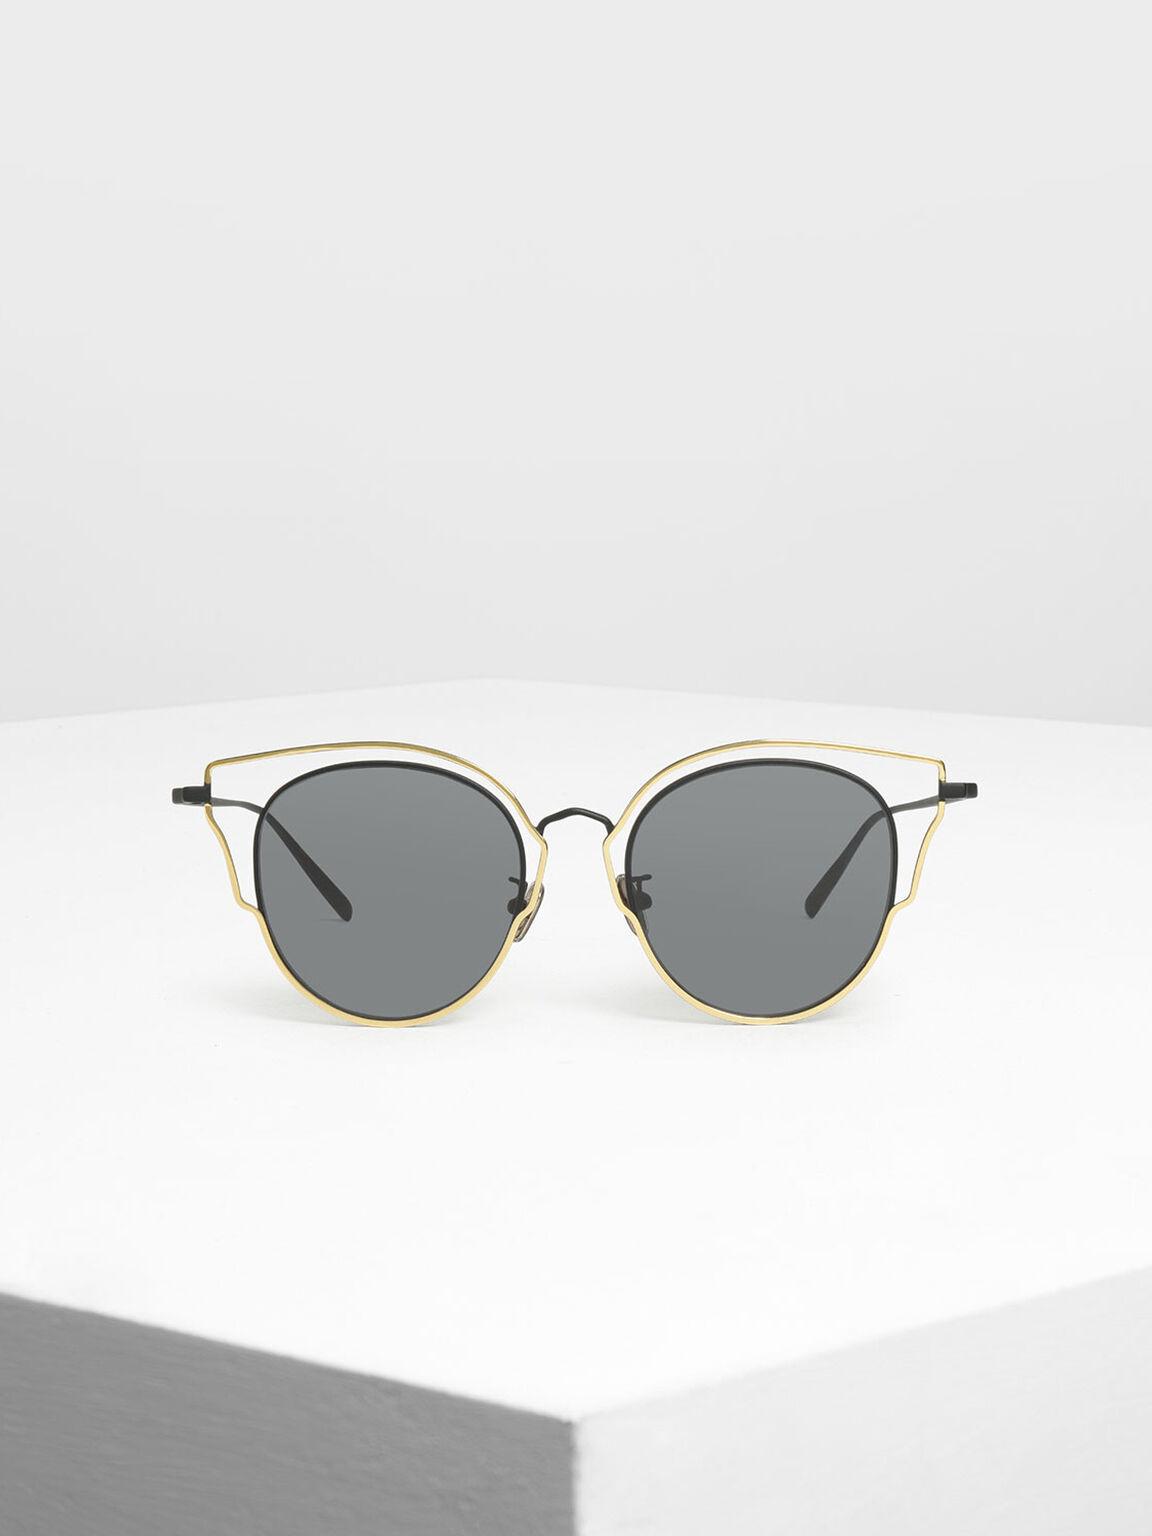 Double Frame Wingtip Sunglasses, Black, hi-res